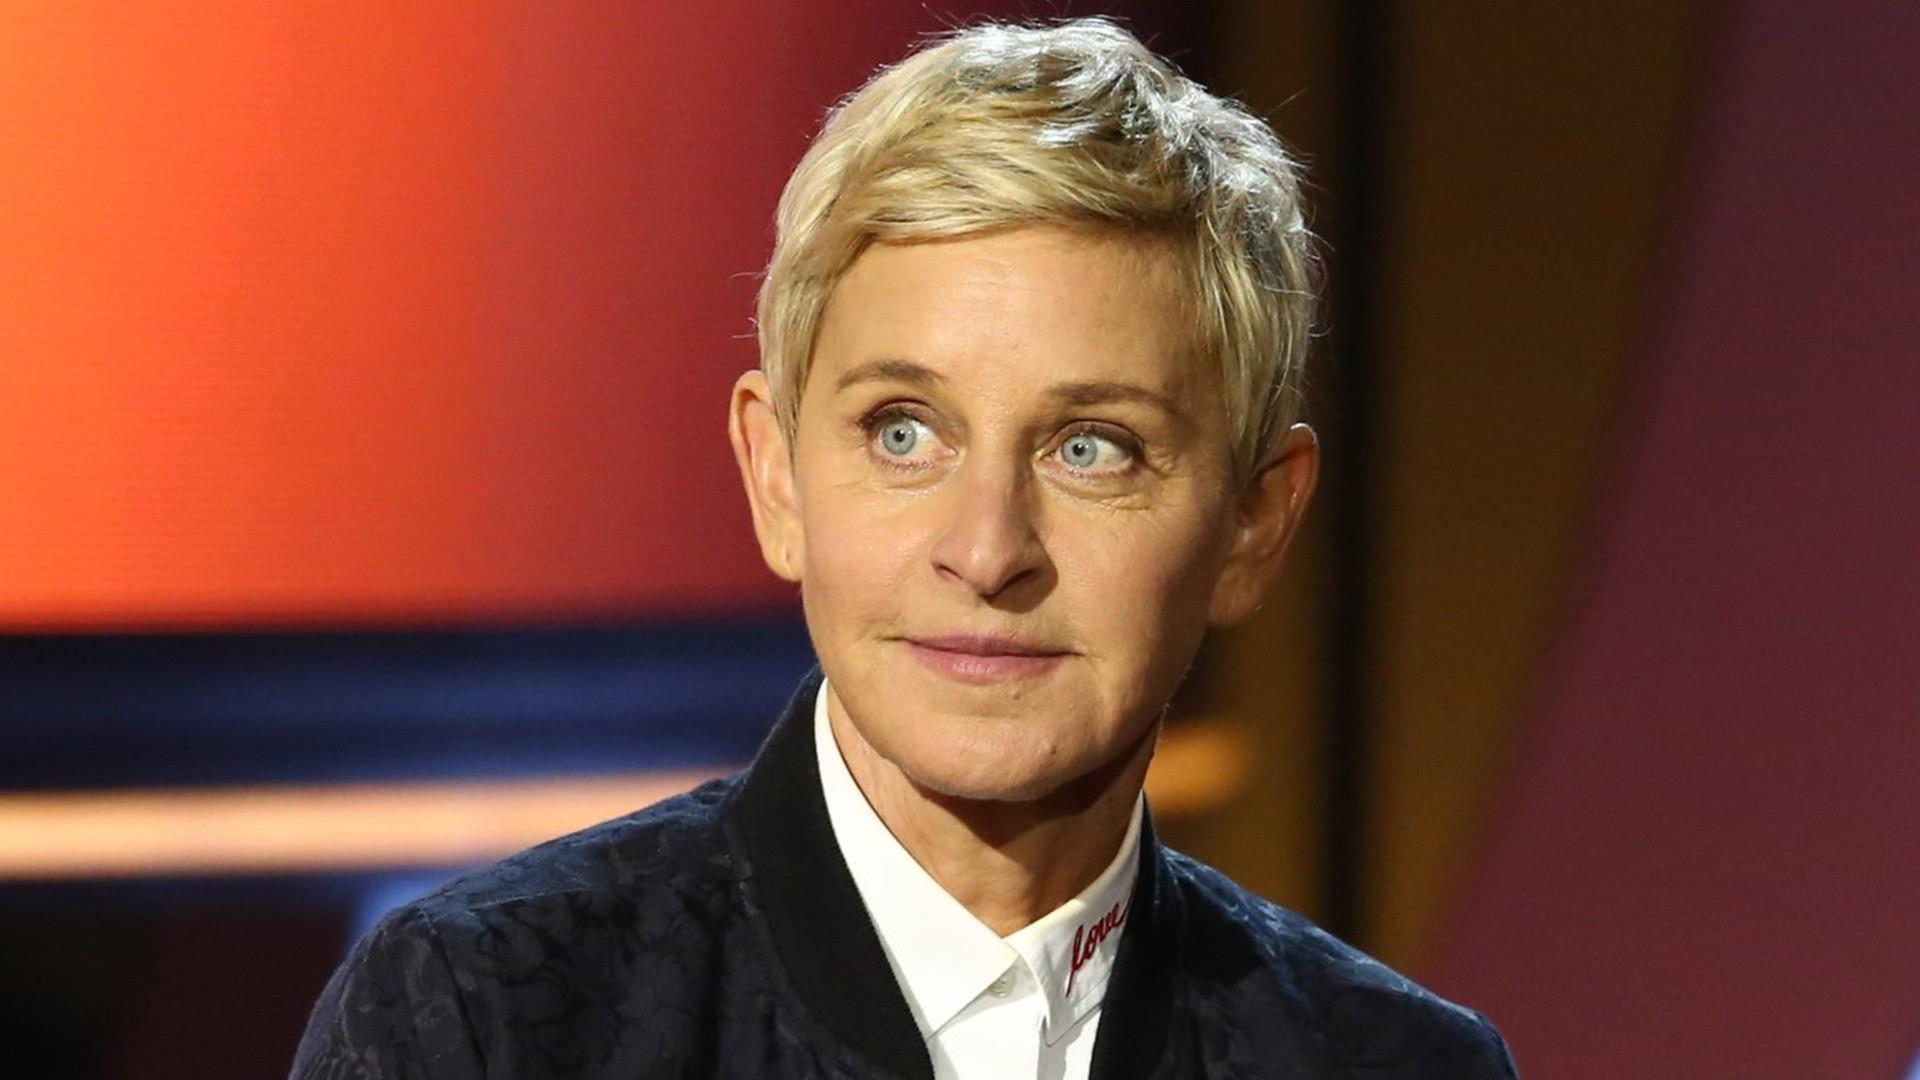 Ellen DeGeneres defends sitting next to George W. Bush at NFL game